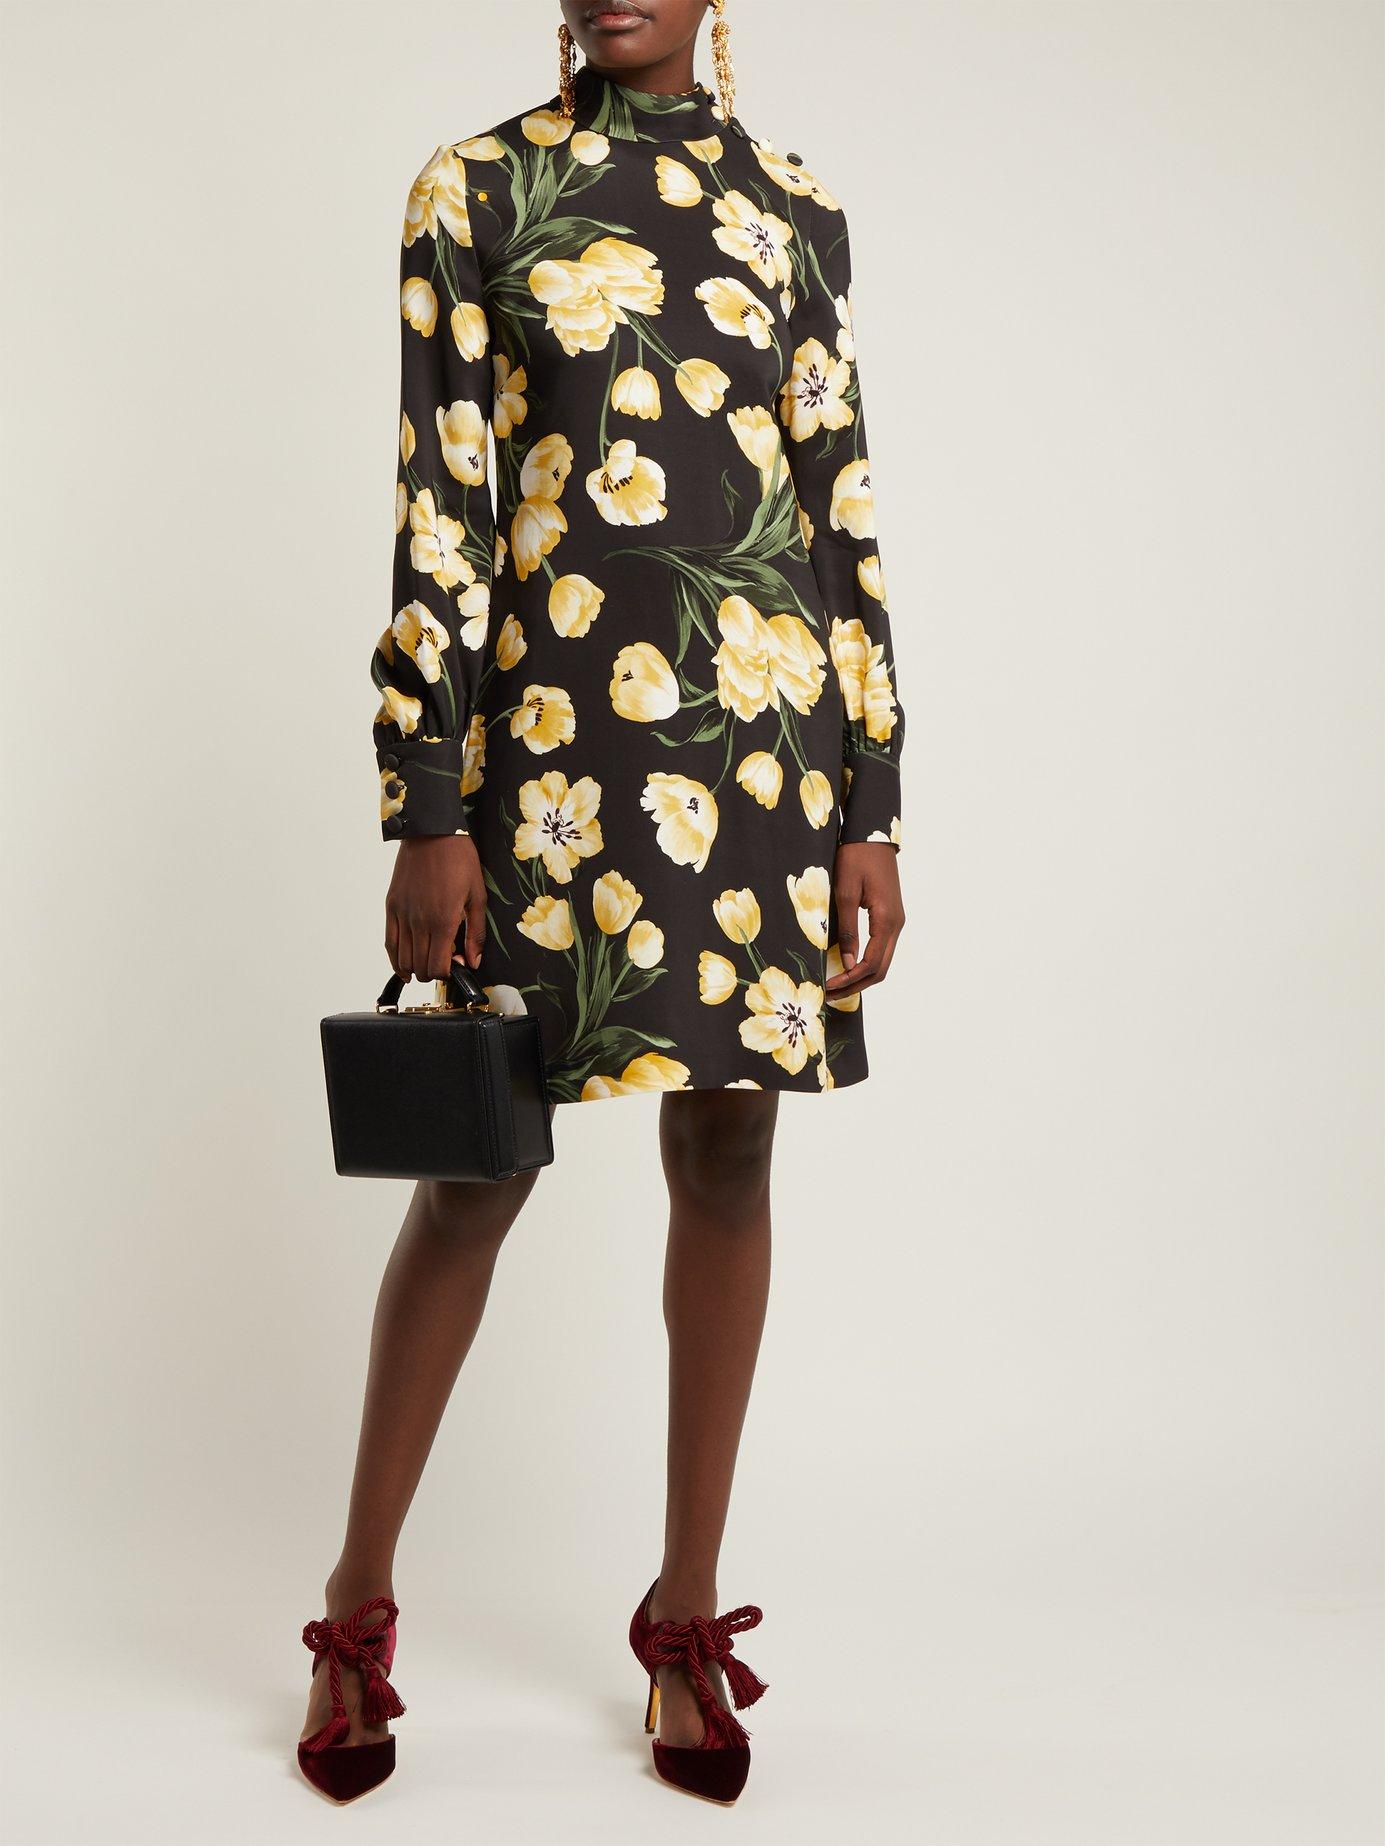 Garland high-neck dress by Goat